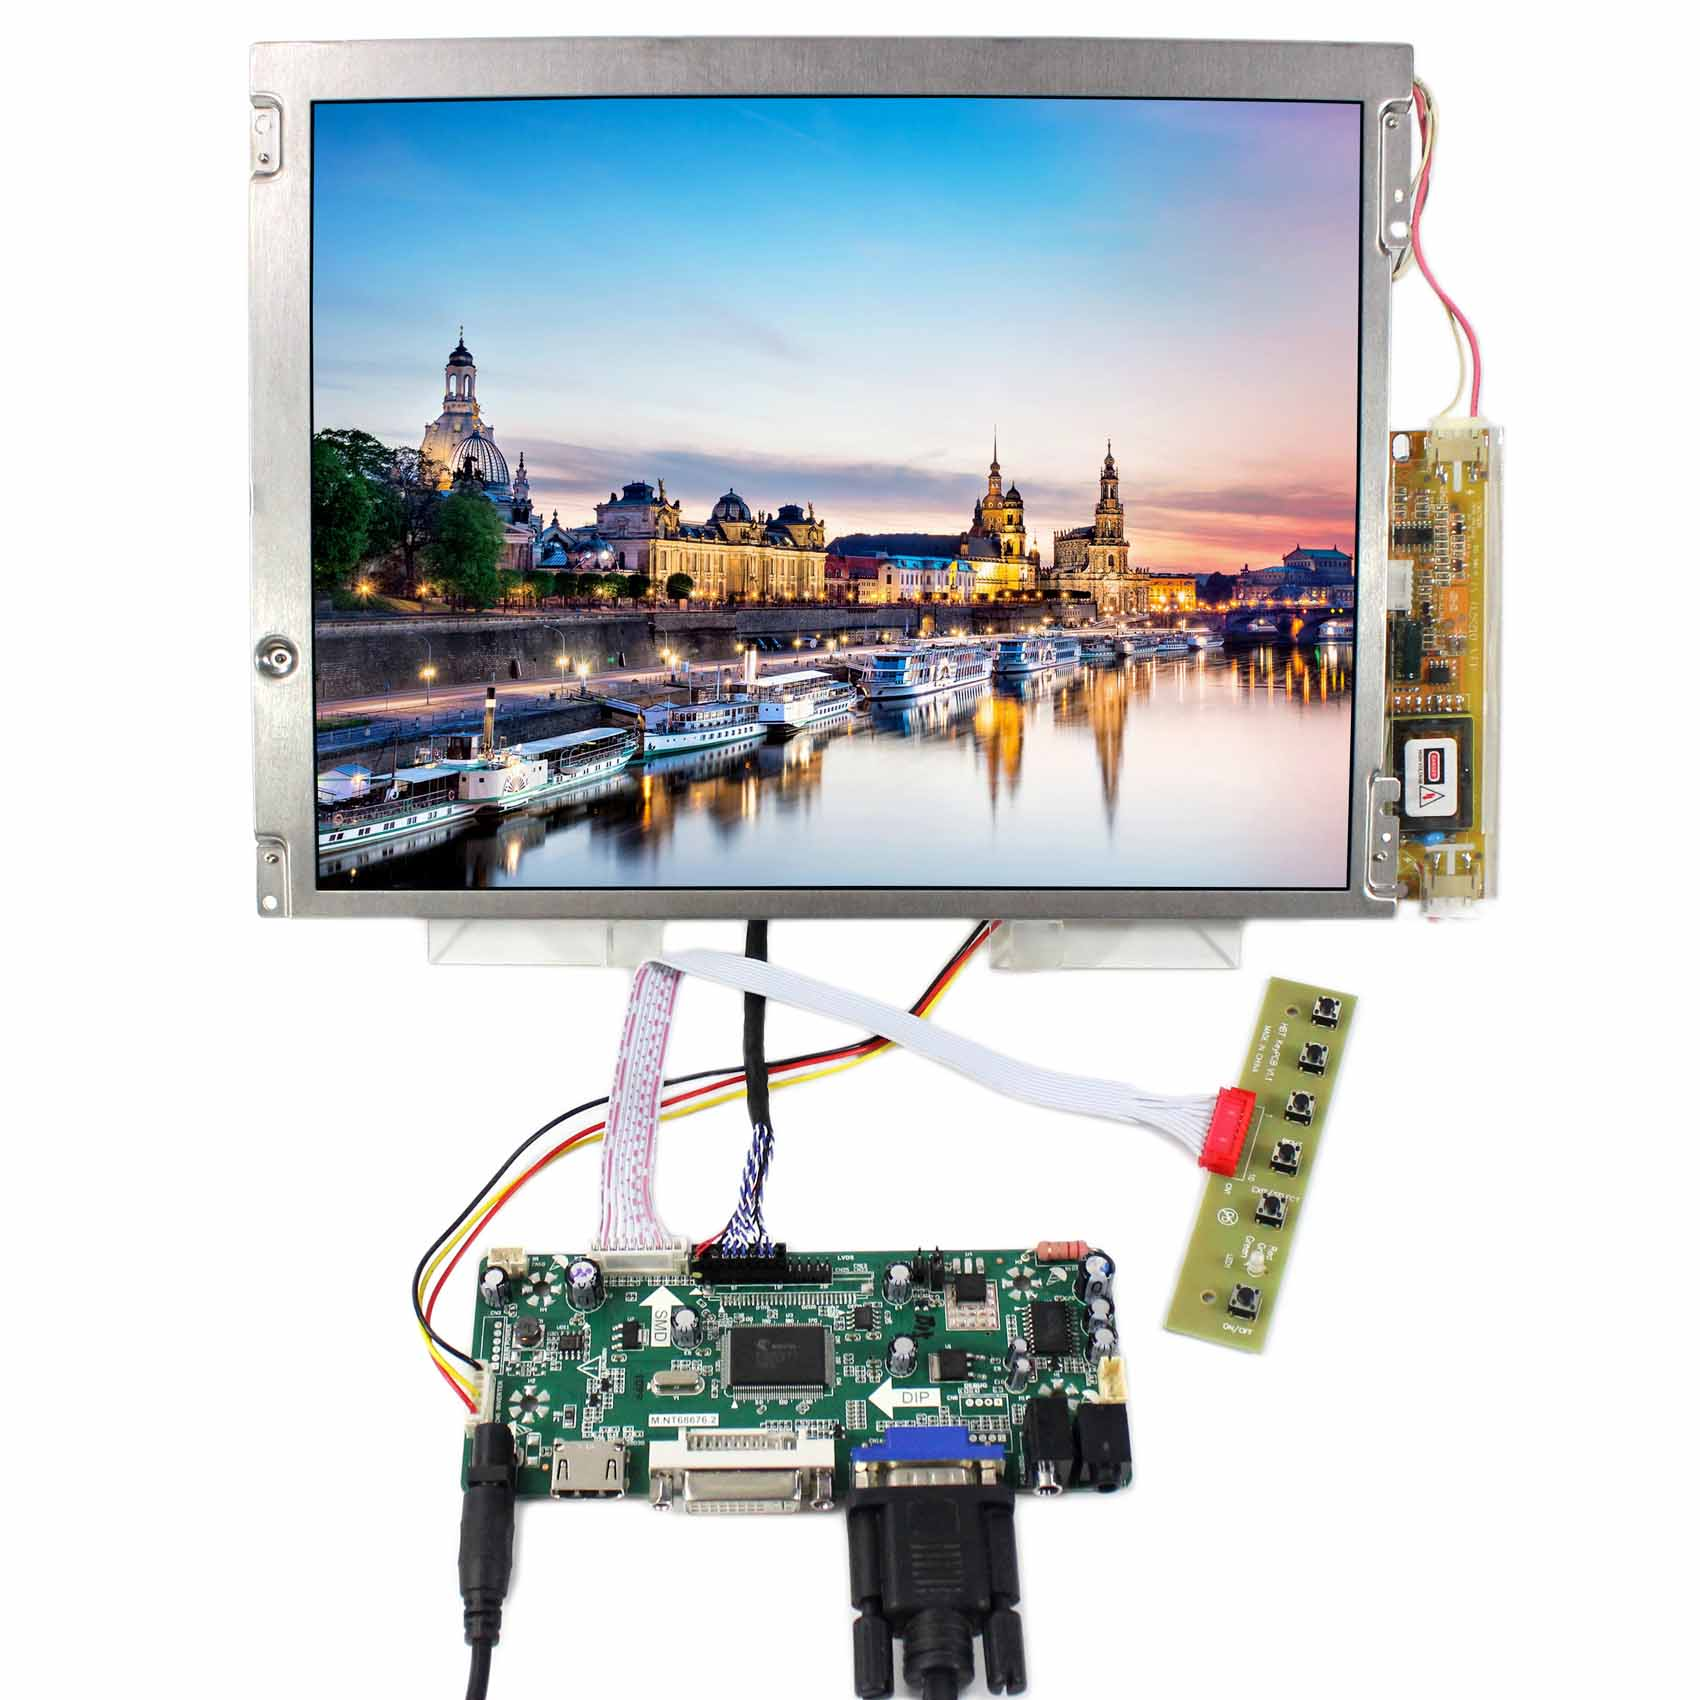 800X600 Resolution 12.1inch LQ121S1LG45 LCD Screen Backlight 2 CCFL M.NT68676  HDMI DVI VGA Board800X600 Resolution 12.1inch LQ121S1LG45 LCD Screen Backlight 2 CCFL M.NT68676  HDMI DVI VGA Board